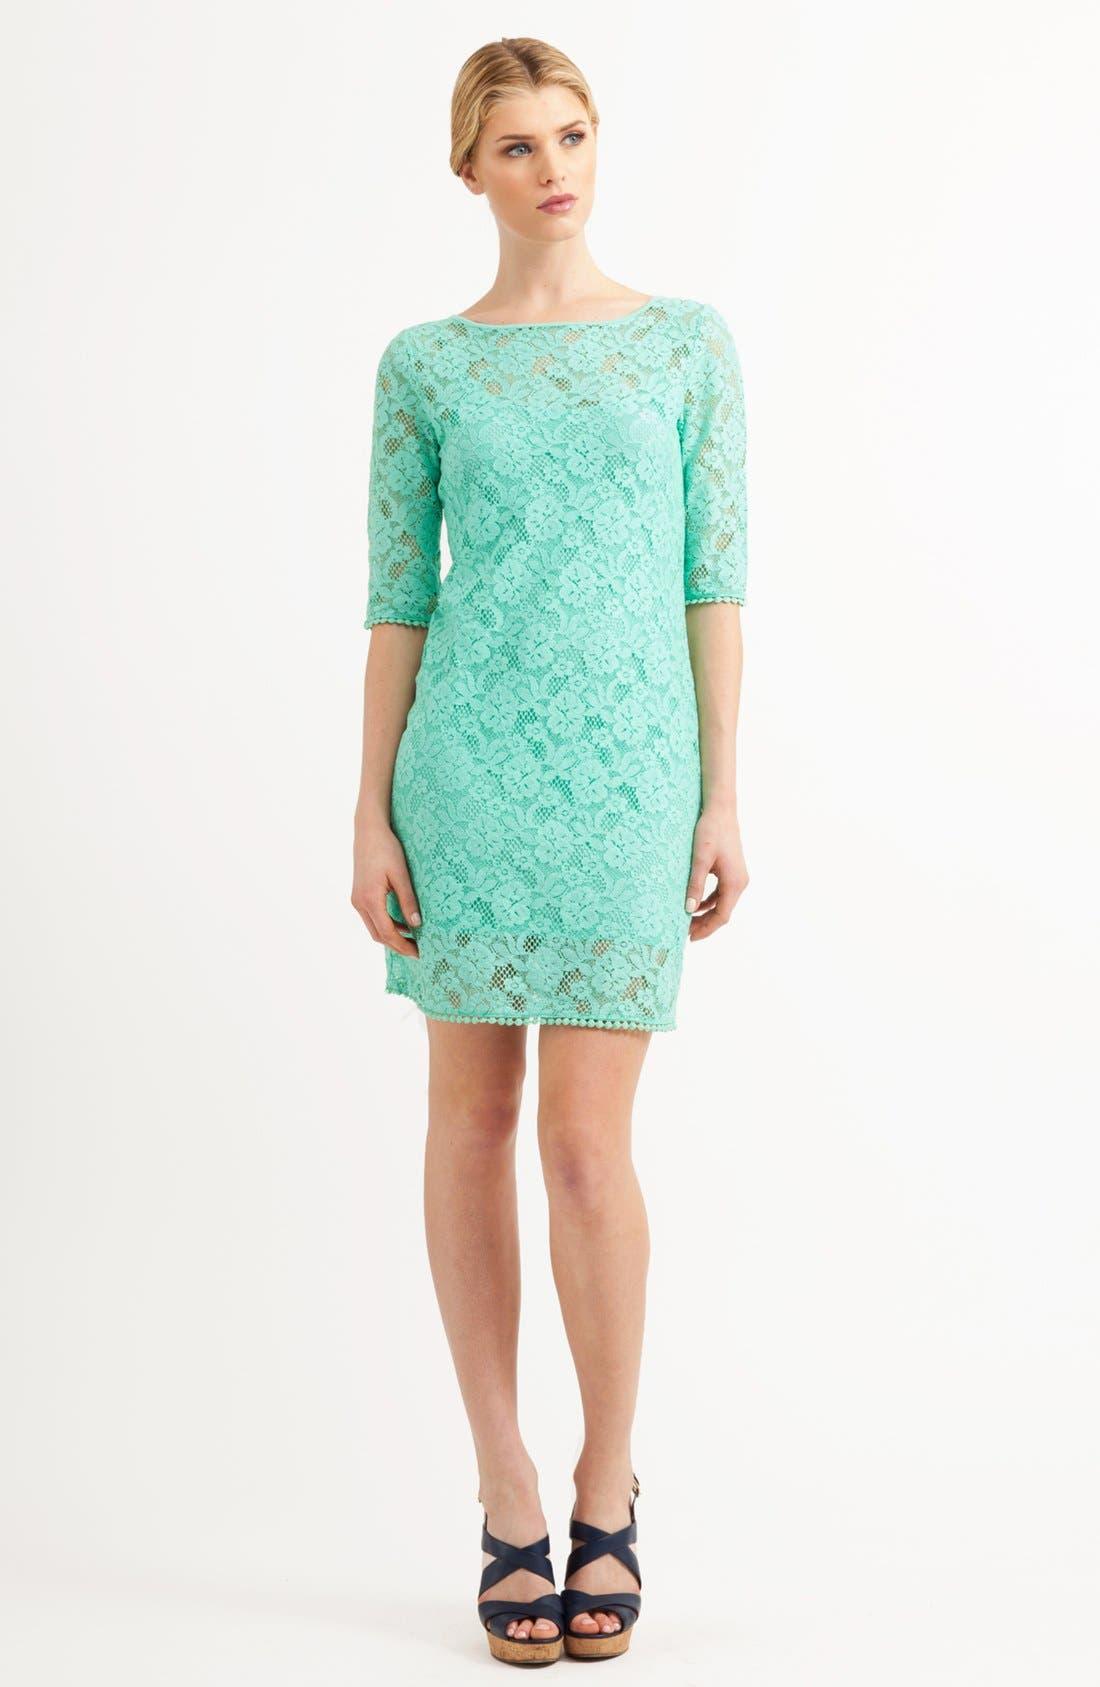 Alternate Image 1 Selected - Three Dots Lace Shift Dress